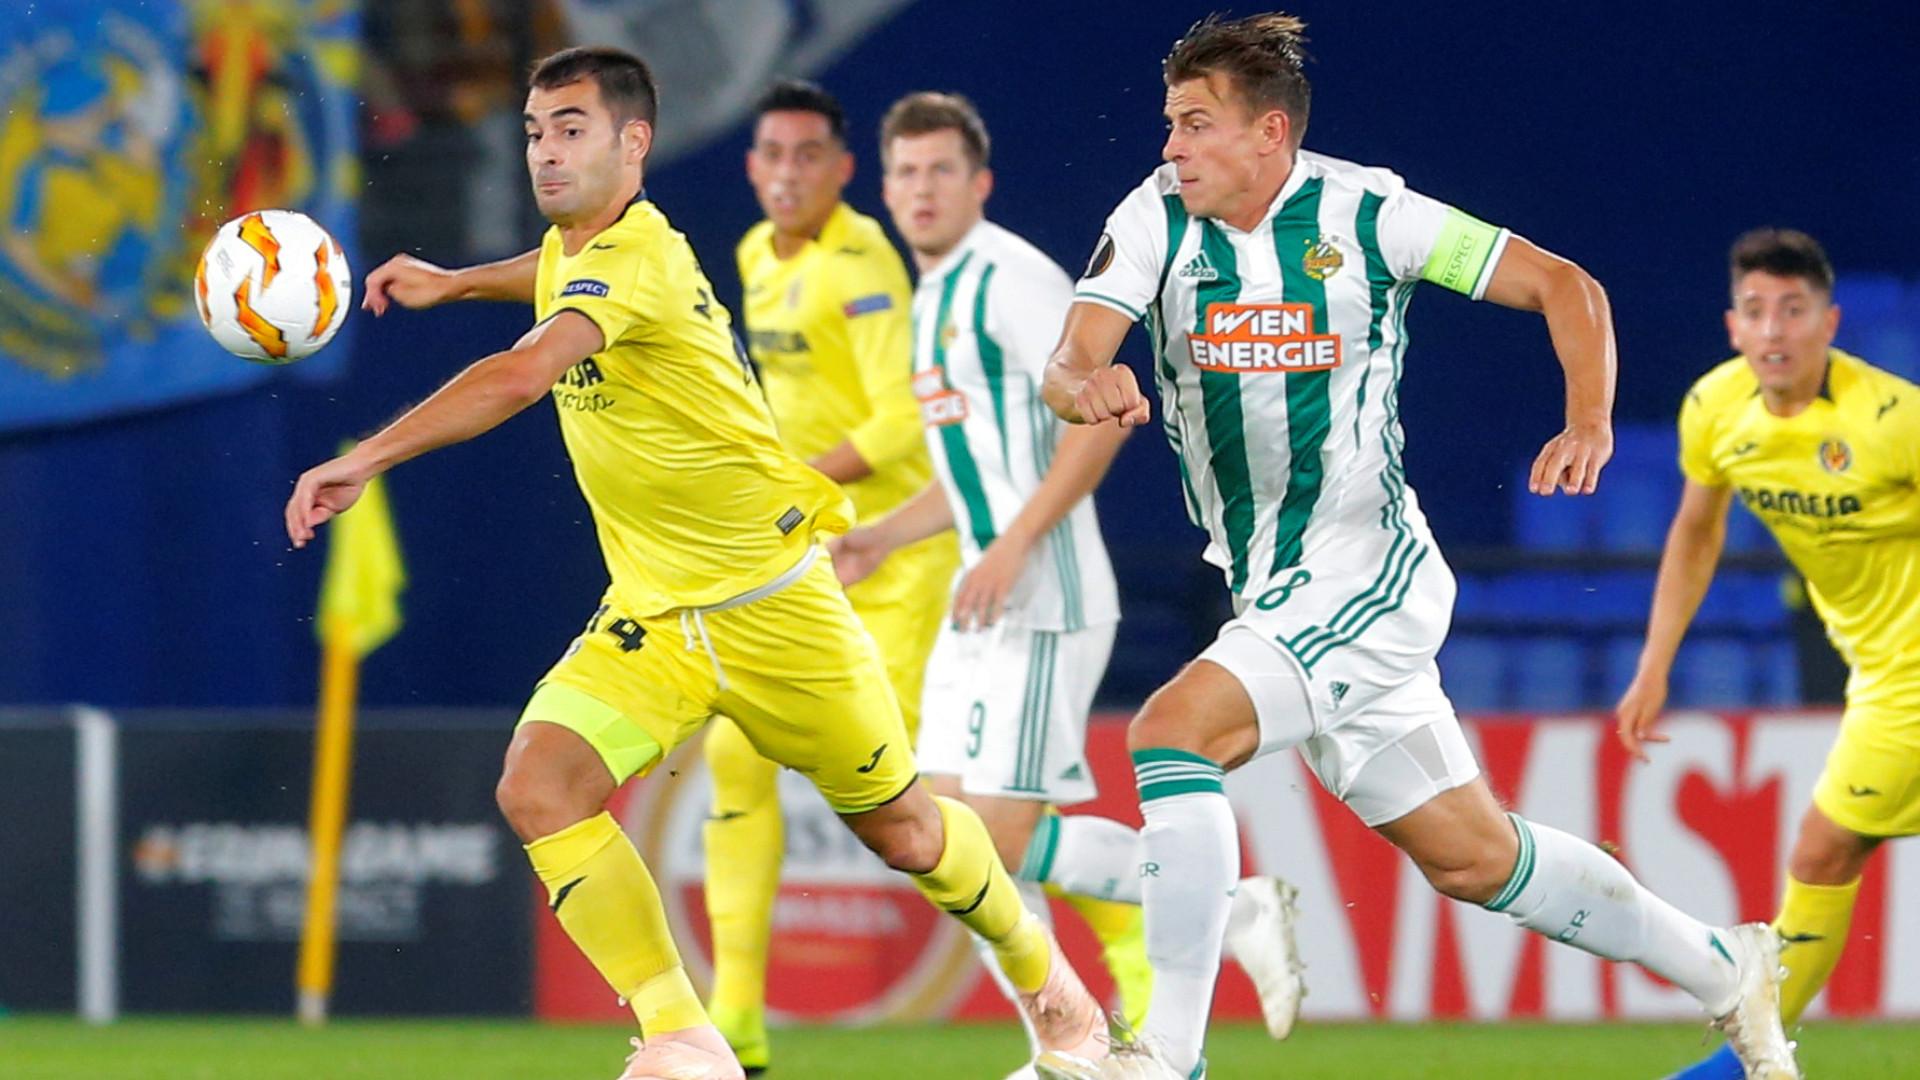 Trigueros entende que visita ao Sporting não condiciona Villlarreal